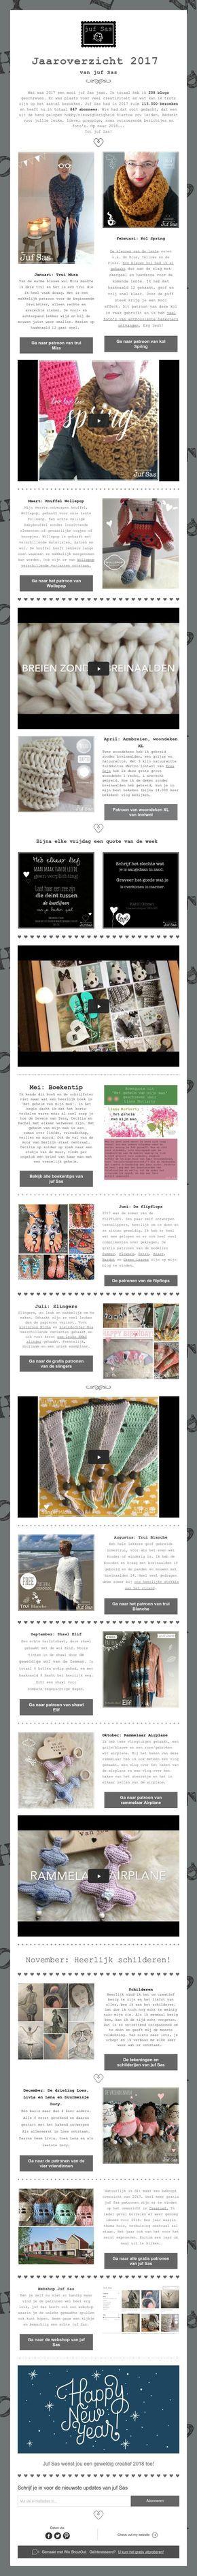 Jaaroverzicht 2017 #jufsas #haken #gratispatroon #creatief #crochet #overzicht #nieuwsbrief #webshop #col #kol #trui #breien #knitting #hakeniship #hakenisleuk #shawl #armbreien #lontwol #knuffel #amigurumi #migurumidoll #amigurimist #doll #virka #häckeln #handmade #pop #jufsascom